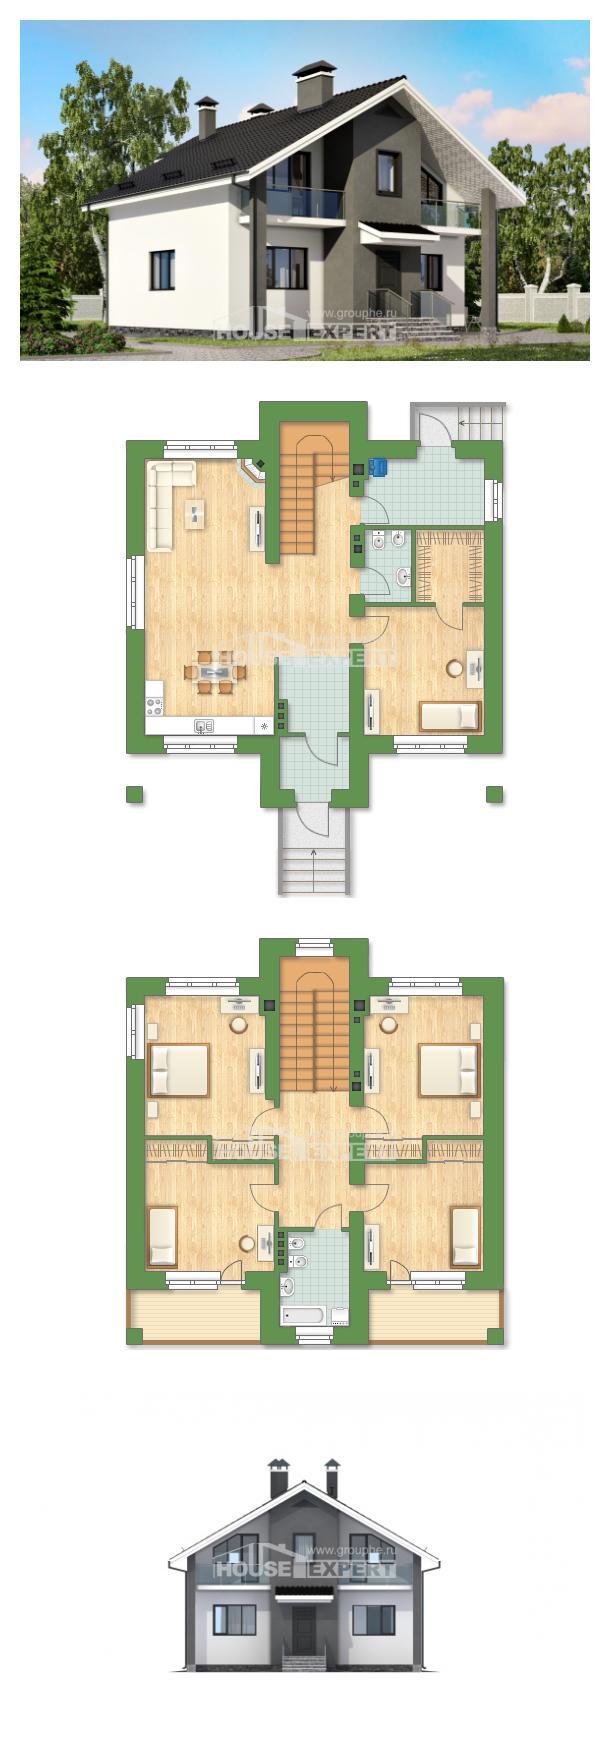 Ev villa projesi 150-005-L | House Expert